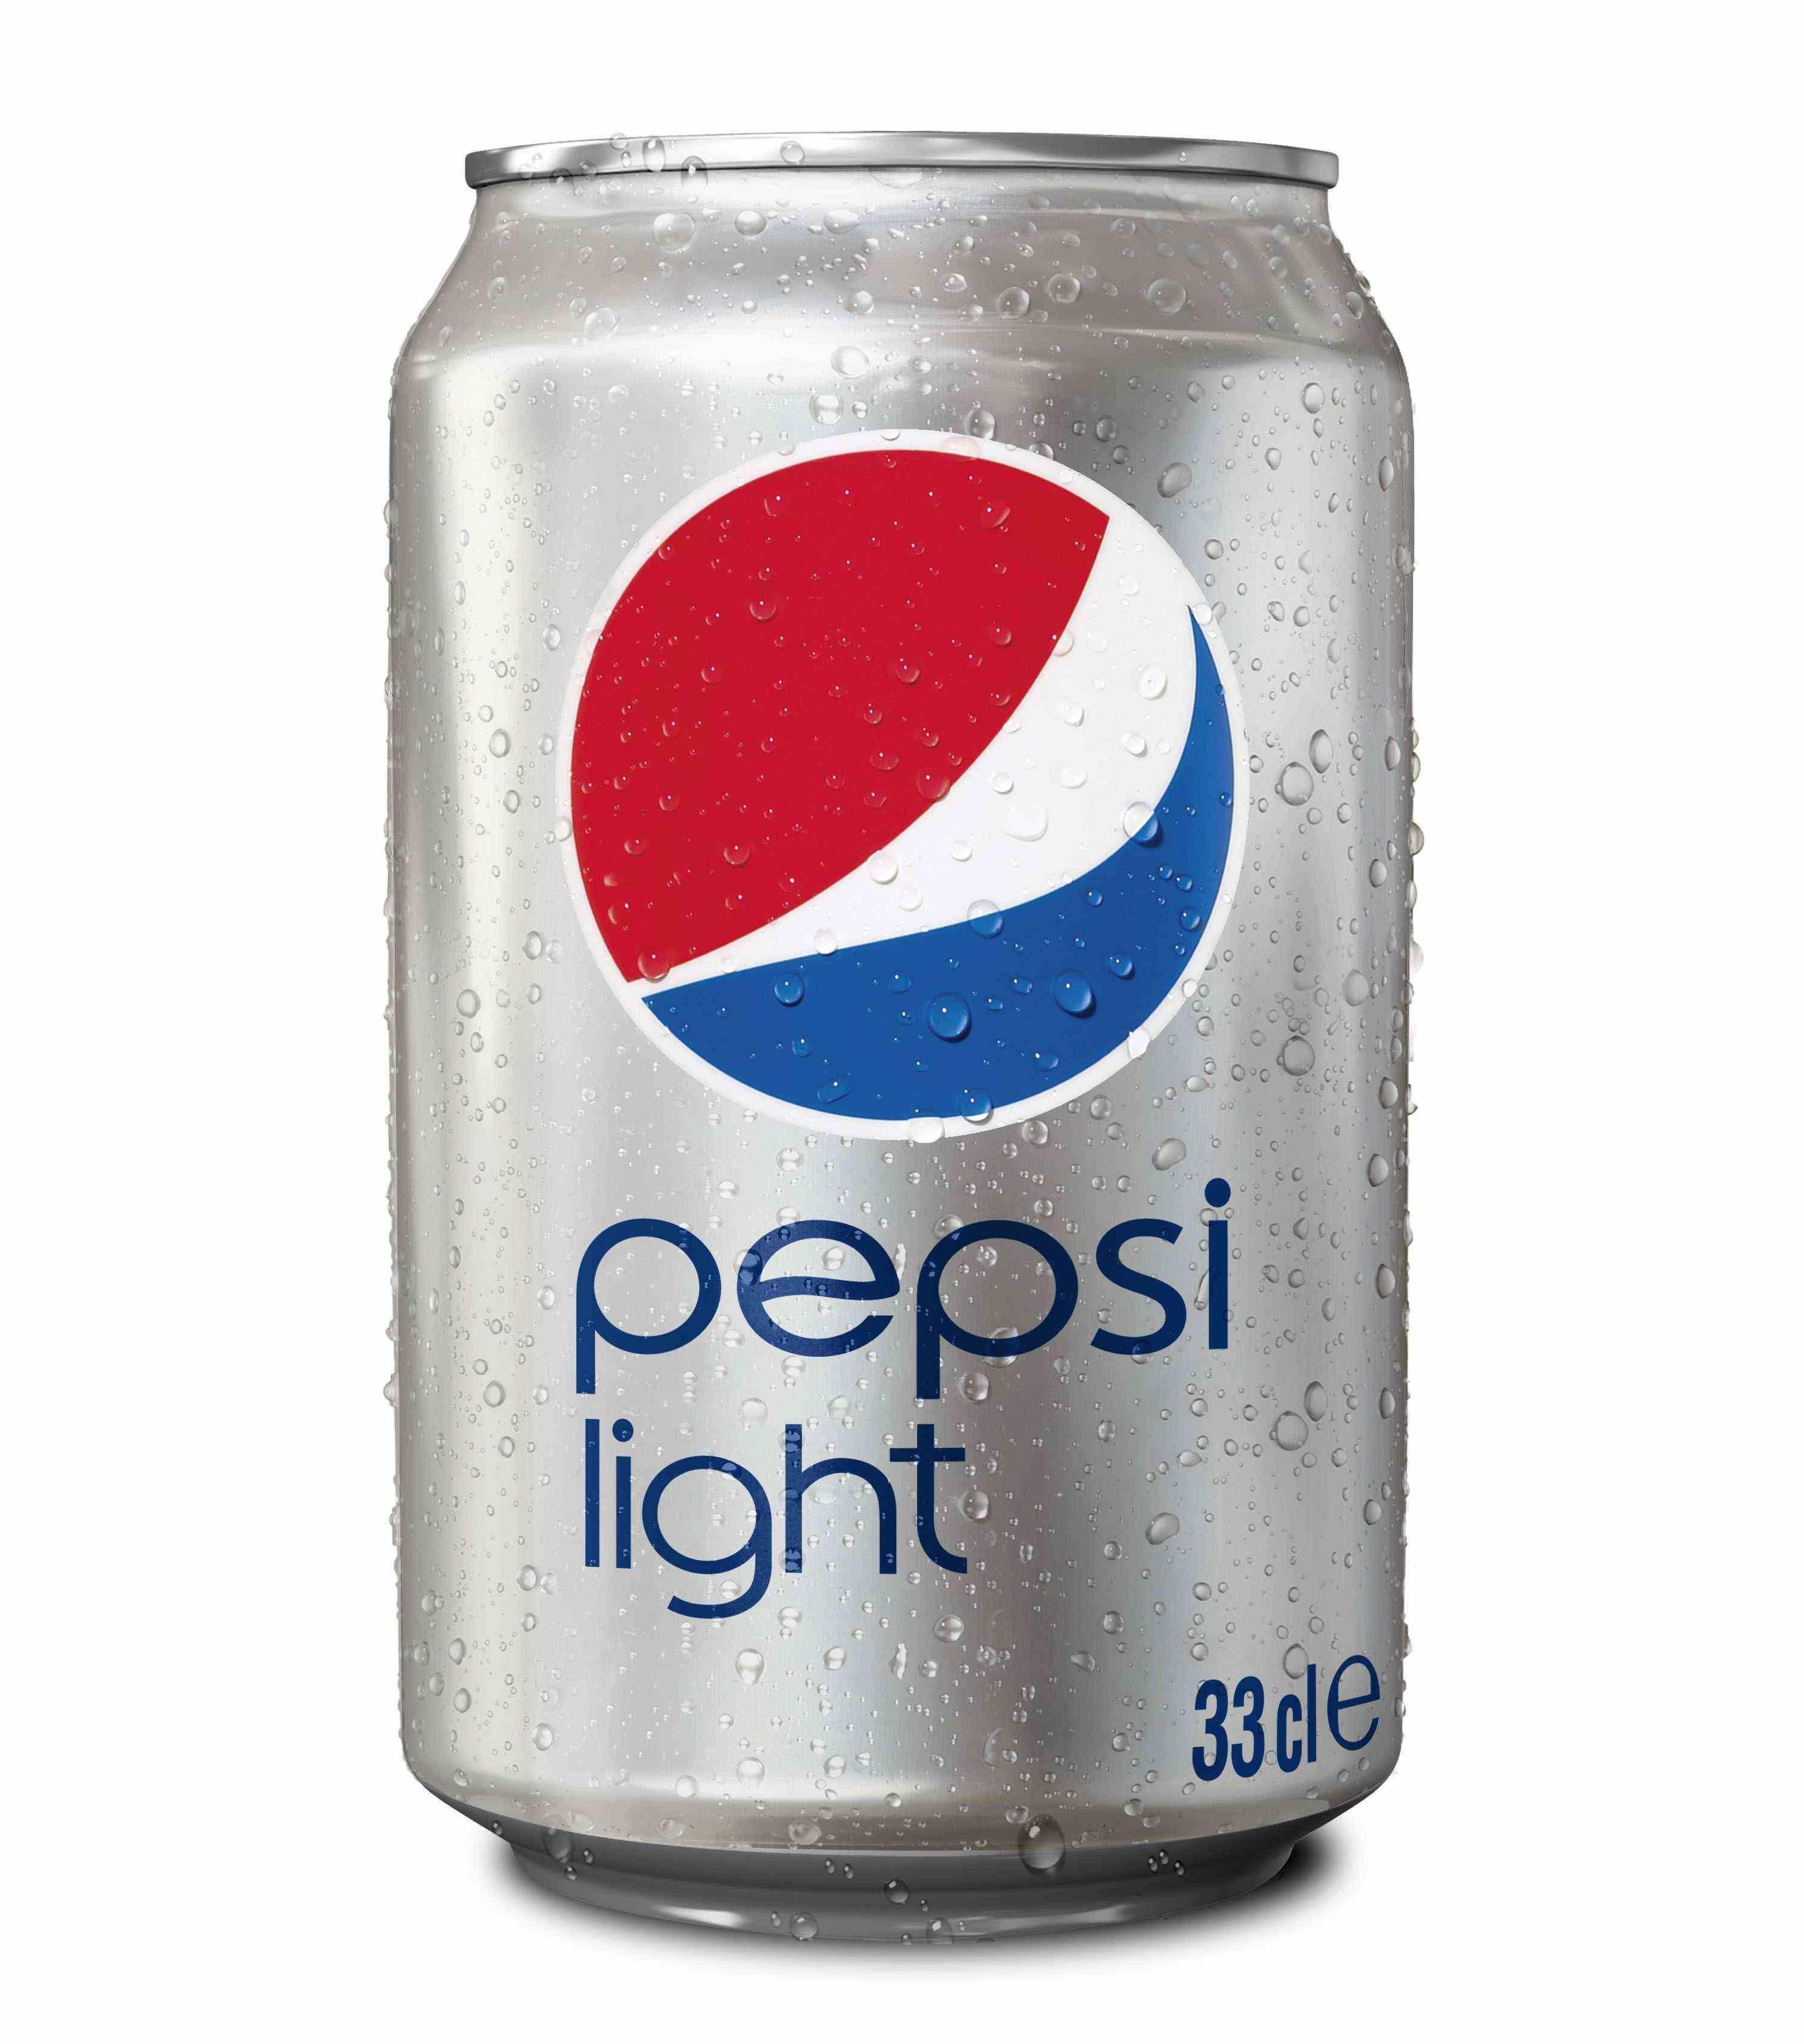 french pepsi can   we offer pepsi cola pepsi light pepsi max 7up ...